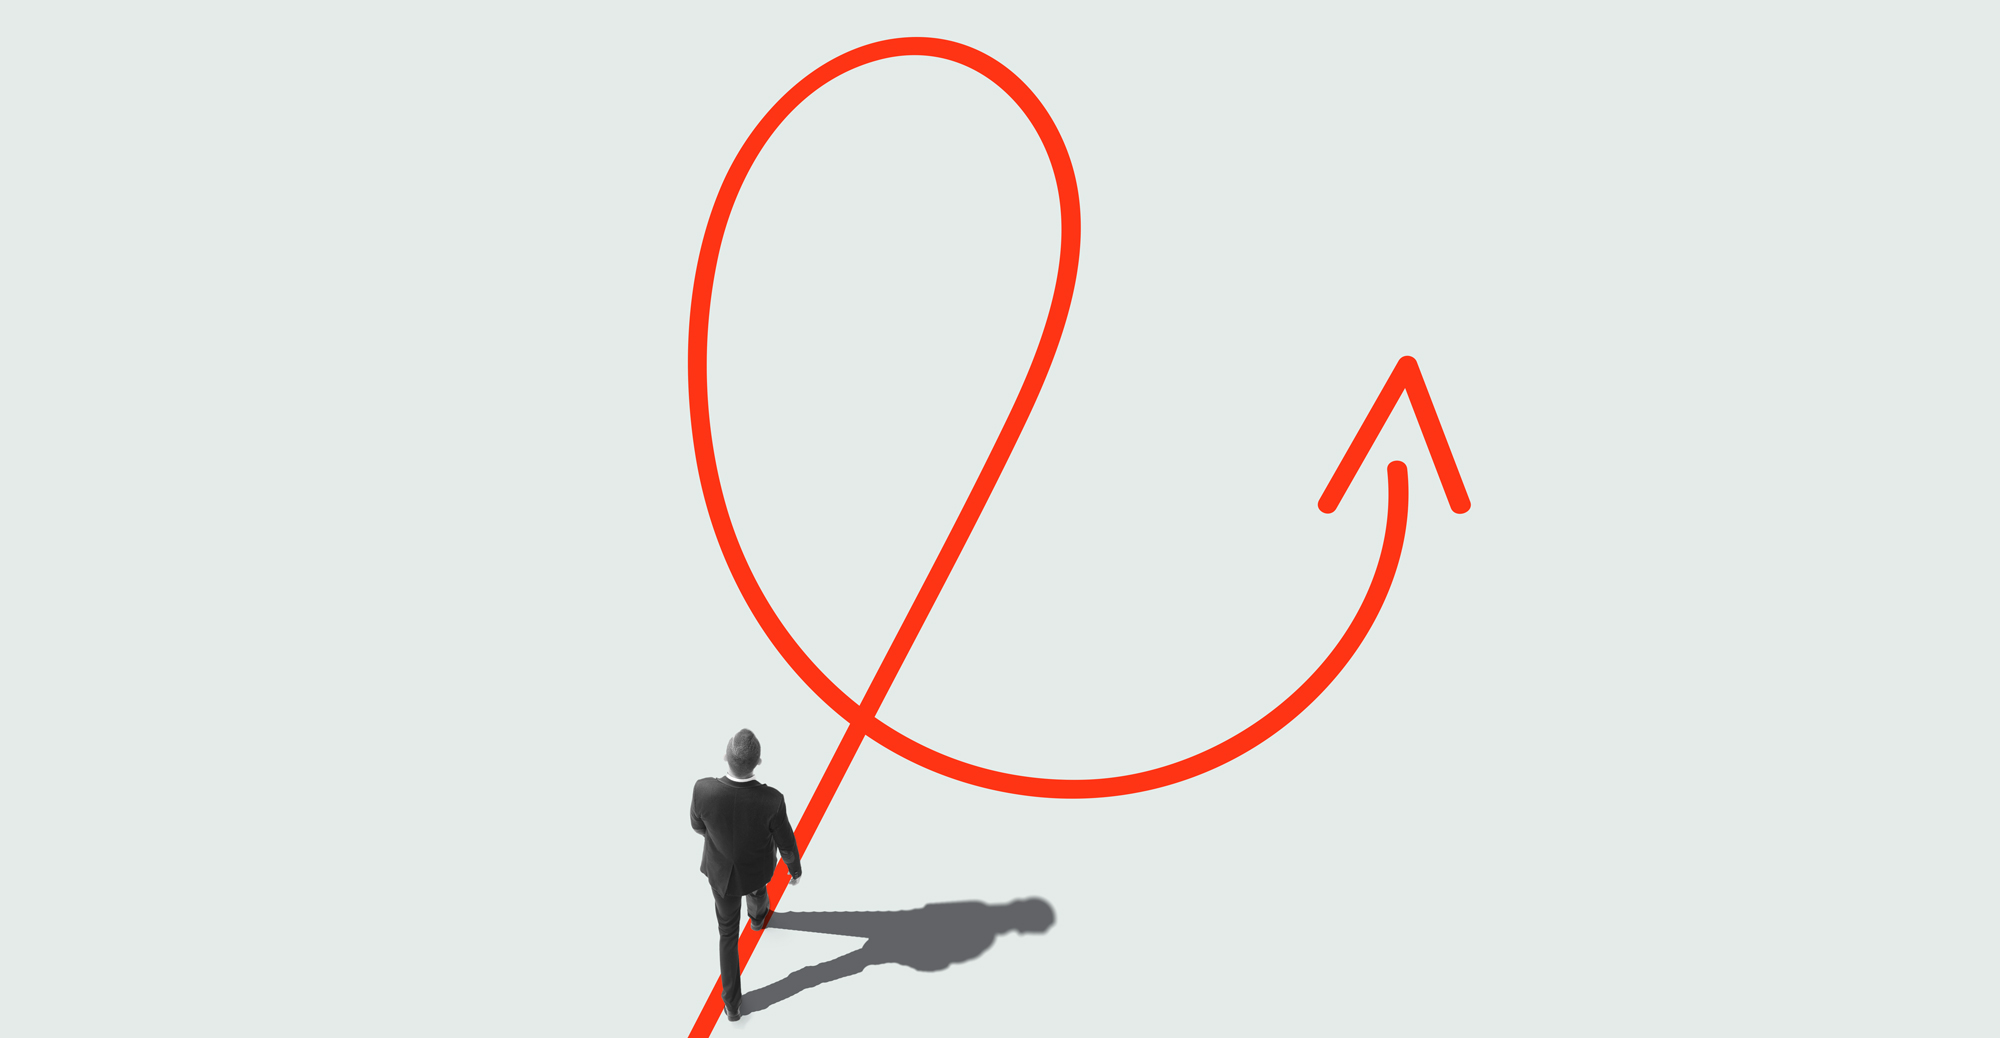 arrow-and-shadow